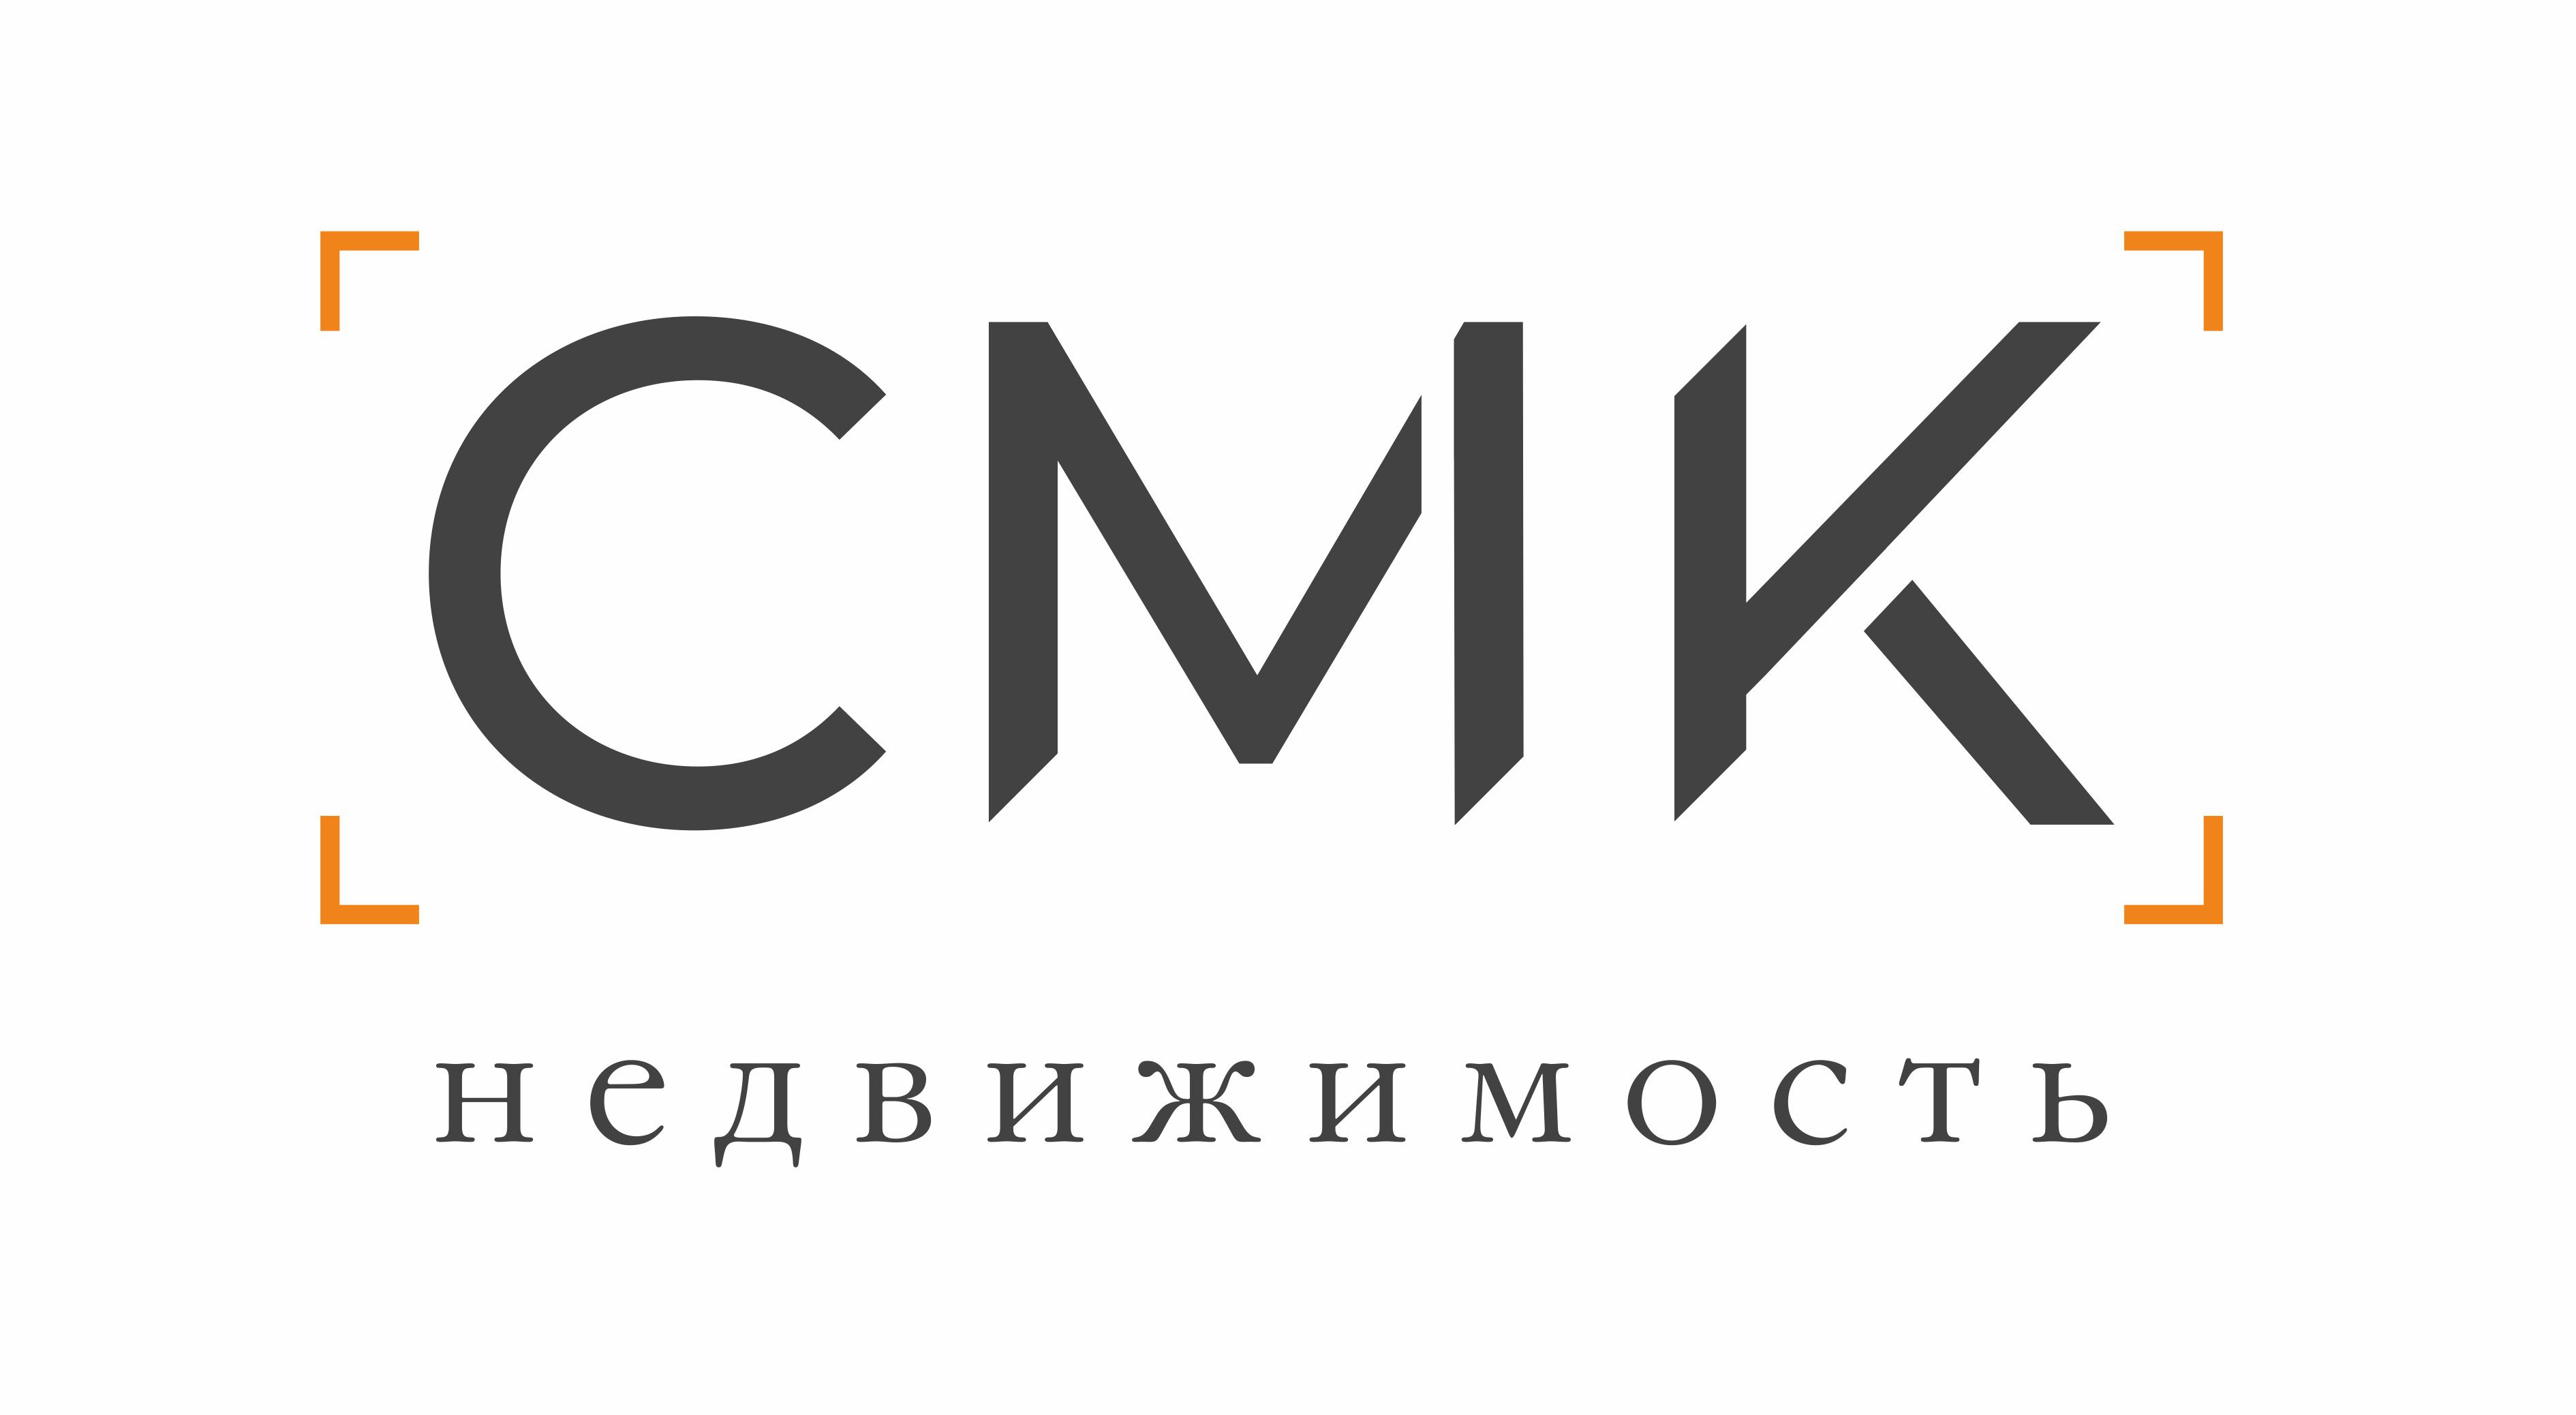 cmk_logo_kvadrat